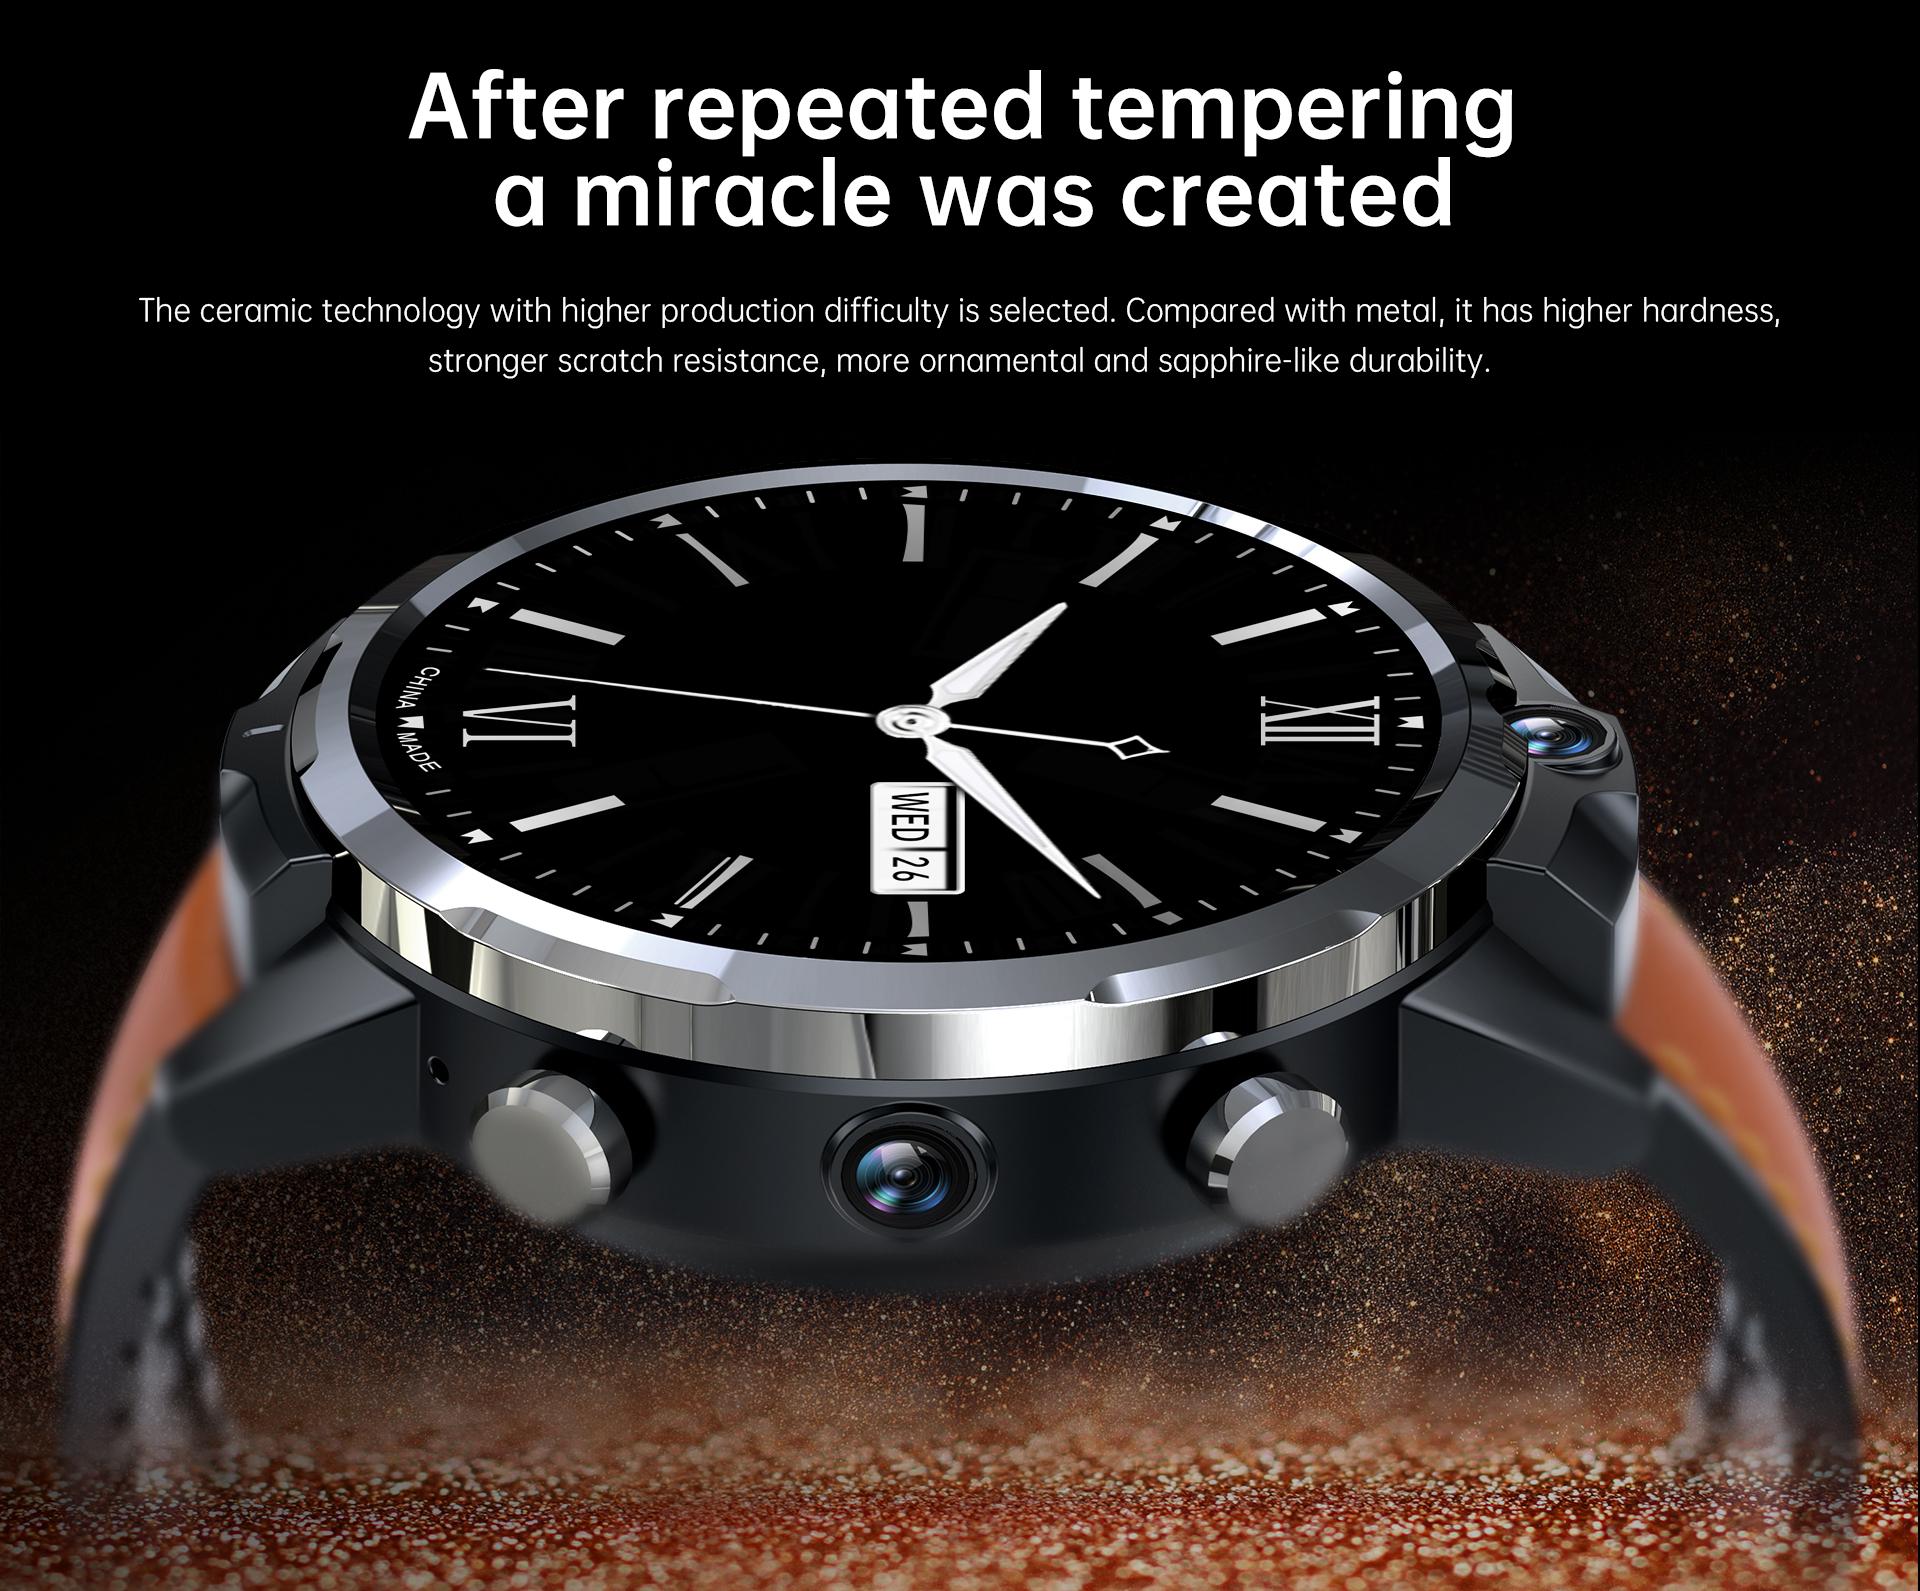 Gt2 Smart Watch 1.6 Inch 3+32gb Hd Screen Face Recognition Ip67 Waterproof Smartwatch Brown